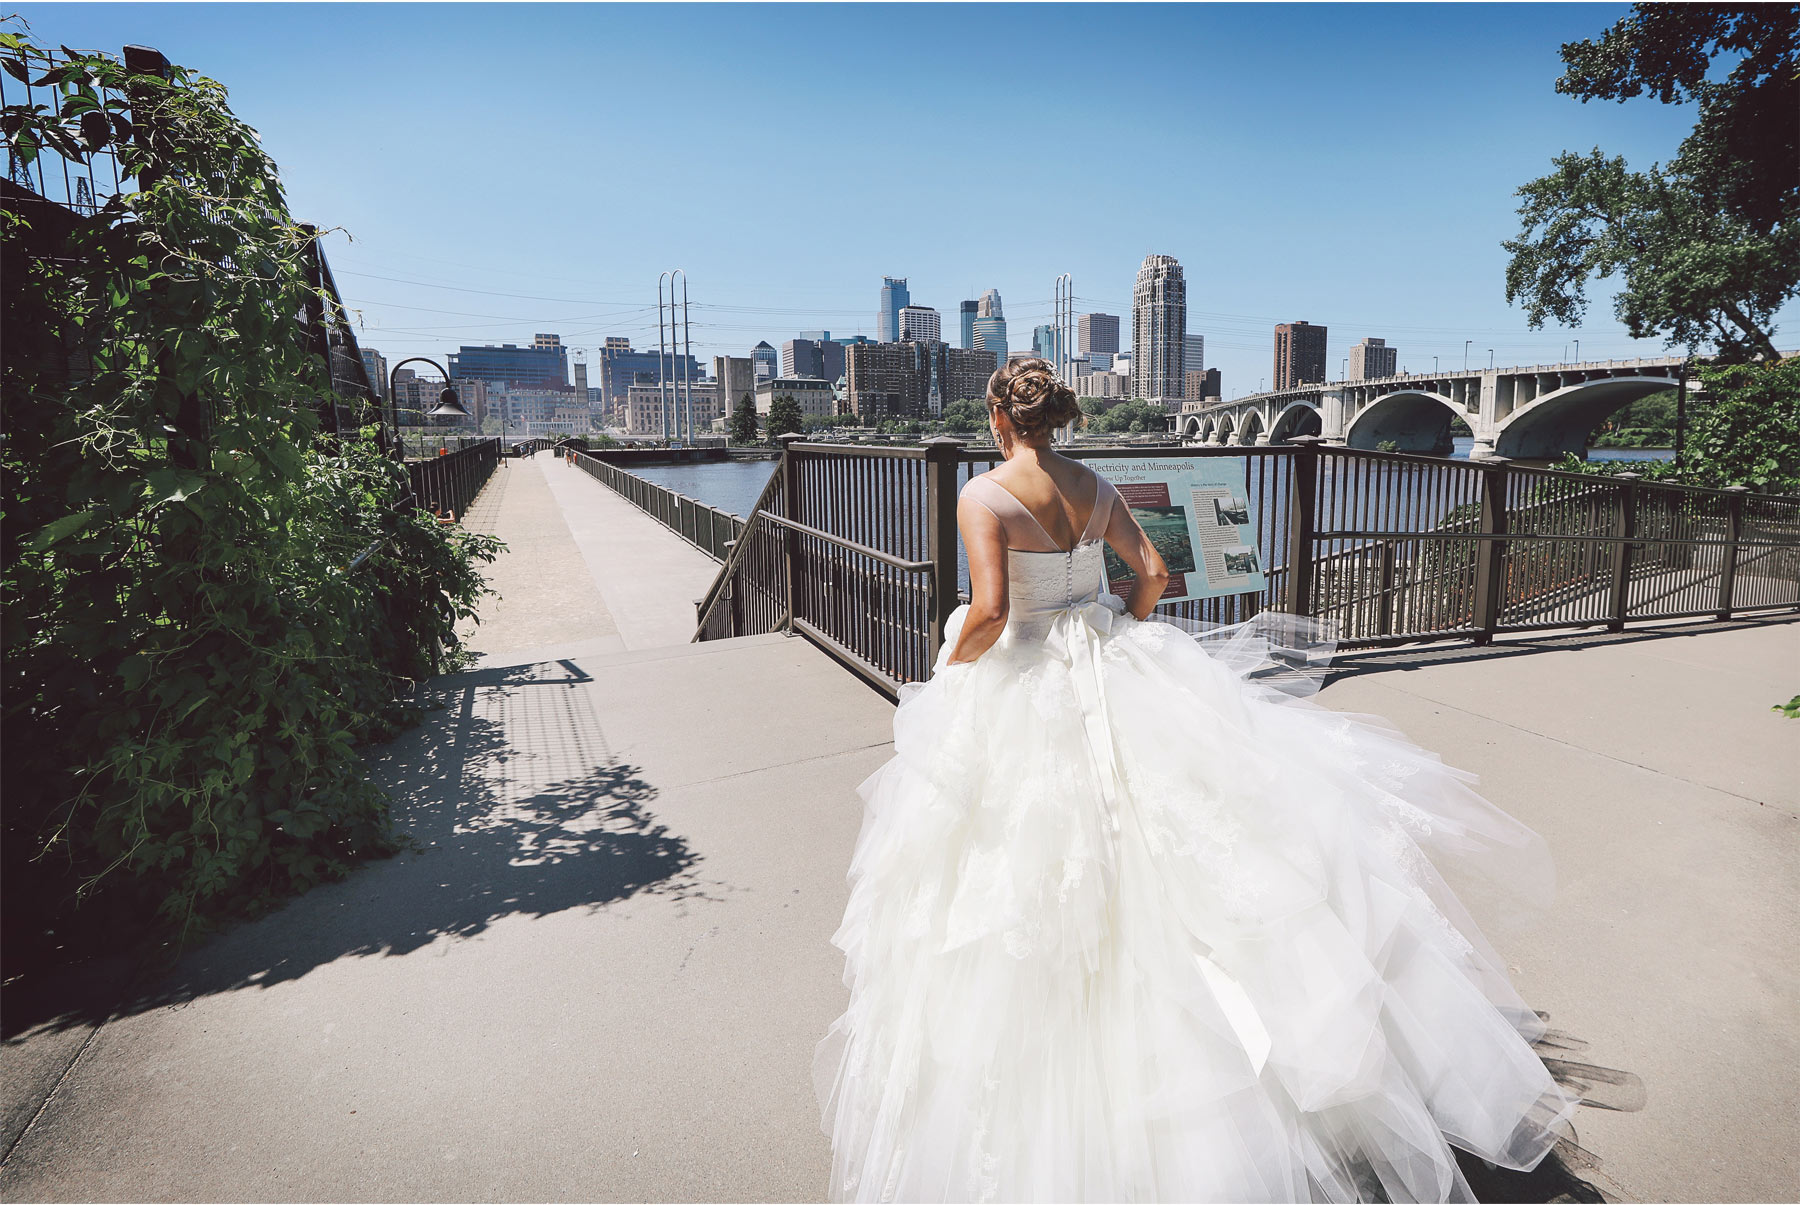 03-Minneapolis-Minnesota-Wedding-Photography-by-Vick-Photography-Saint-Anthony-Main-First-Look-Brigid-and-Ernie.jpg